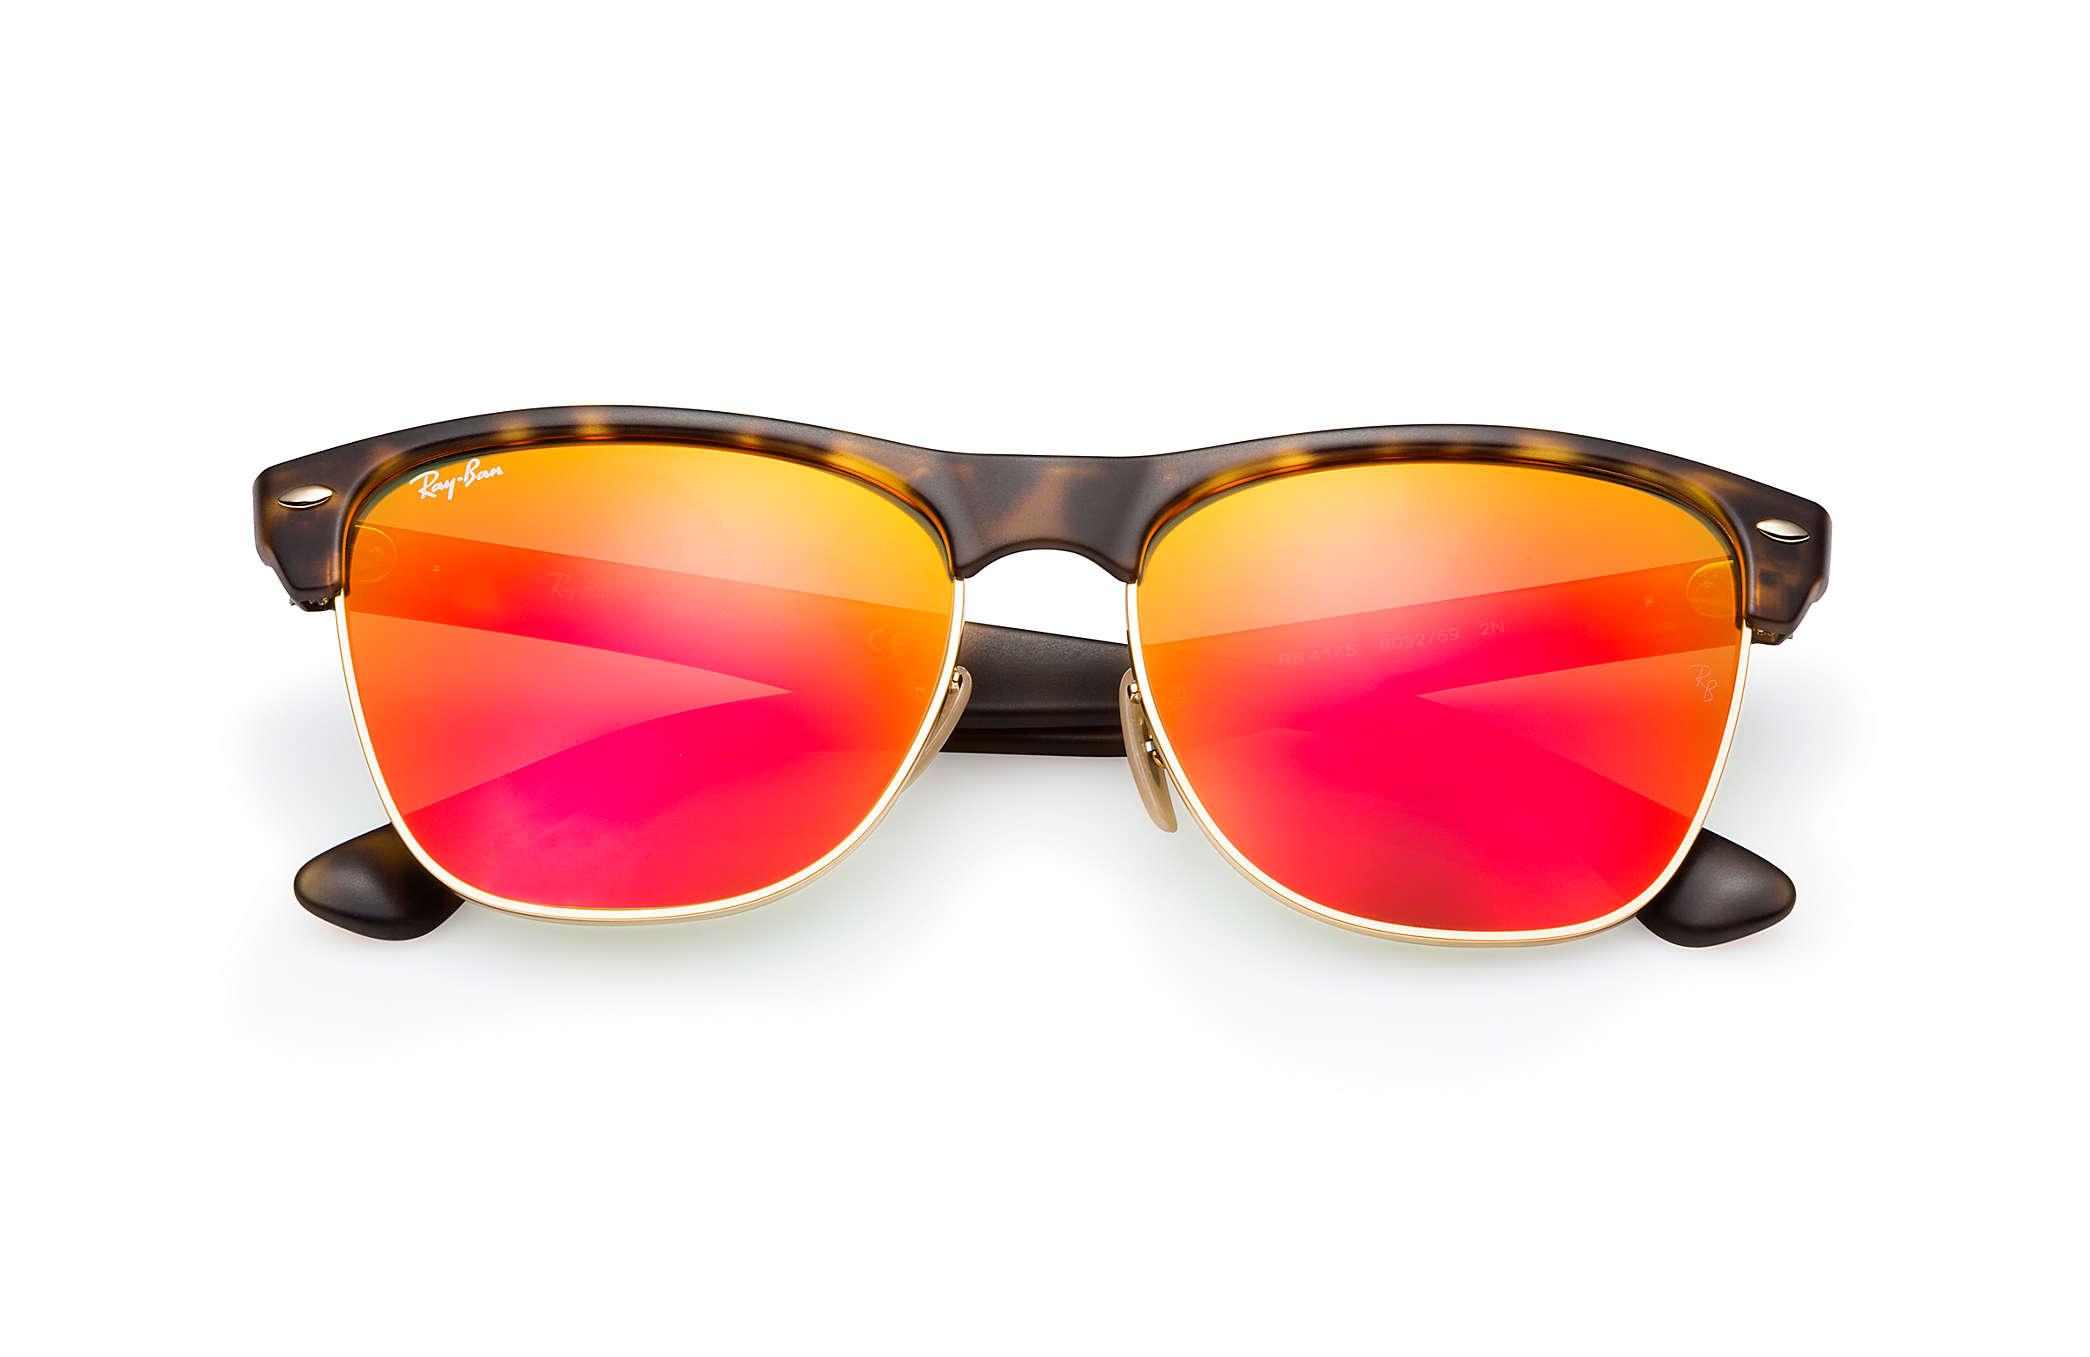 34da3f01ab0aa ... usa ray ban 0rb4175 clubmaster oversized flash lenses tortoise sun  84c29 48124